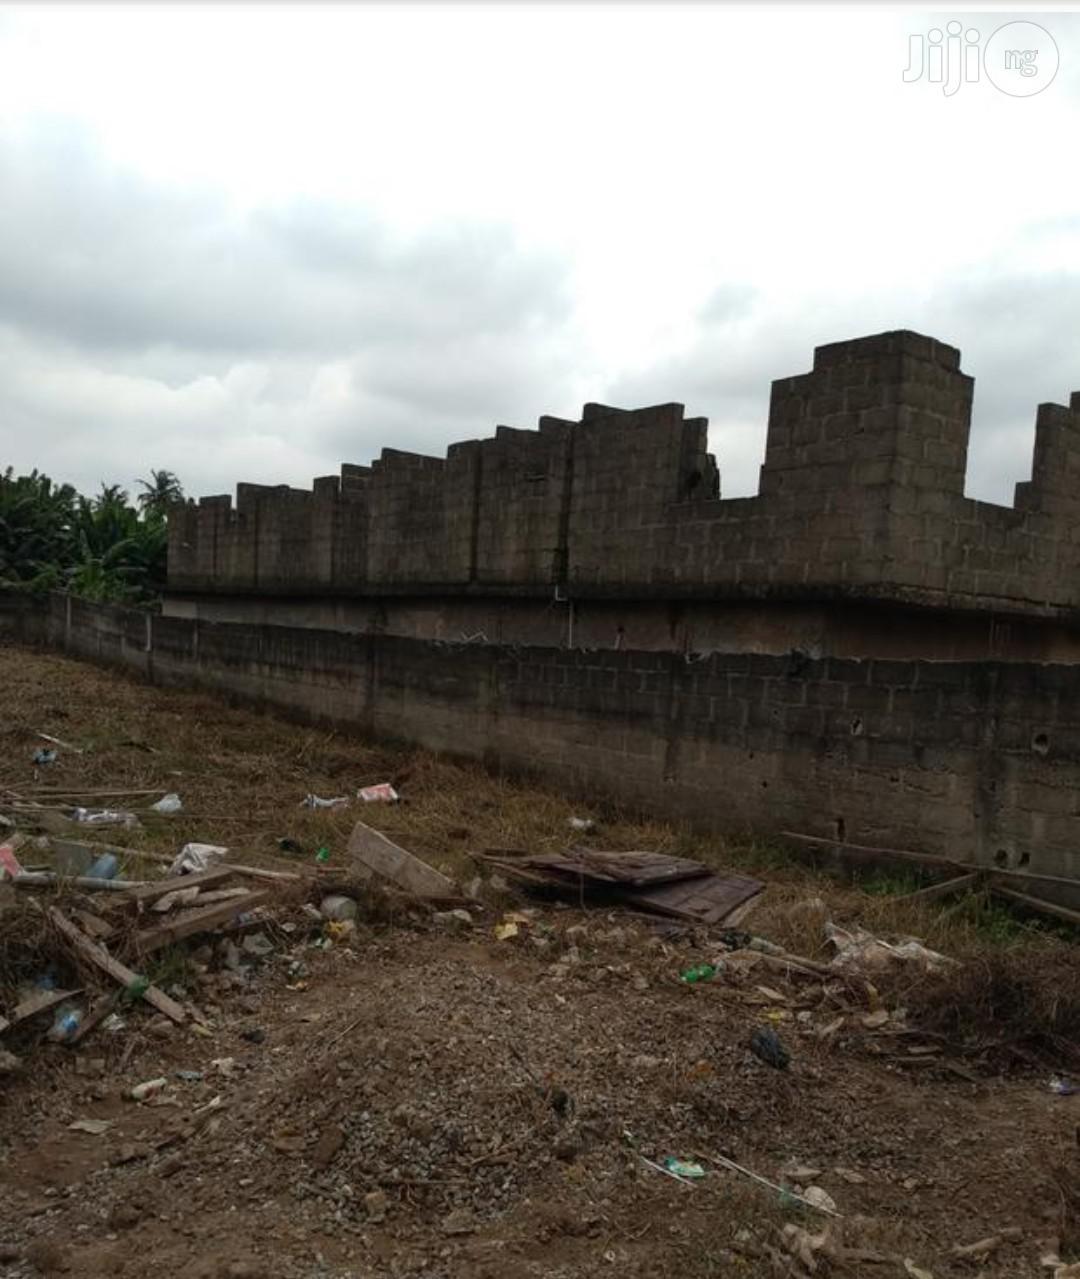 Virgin Land of 400sqm for Sale at Sholuyi Gbagada.